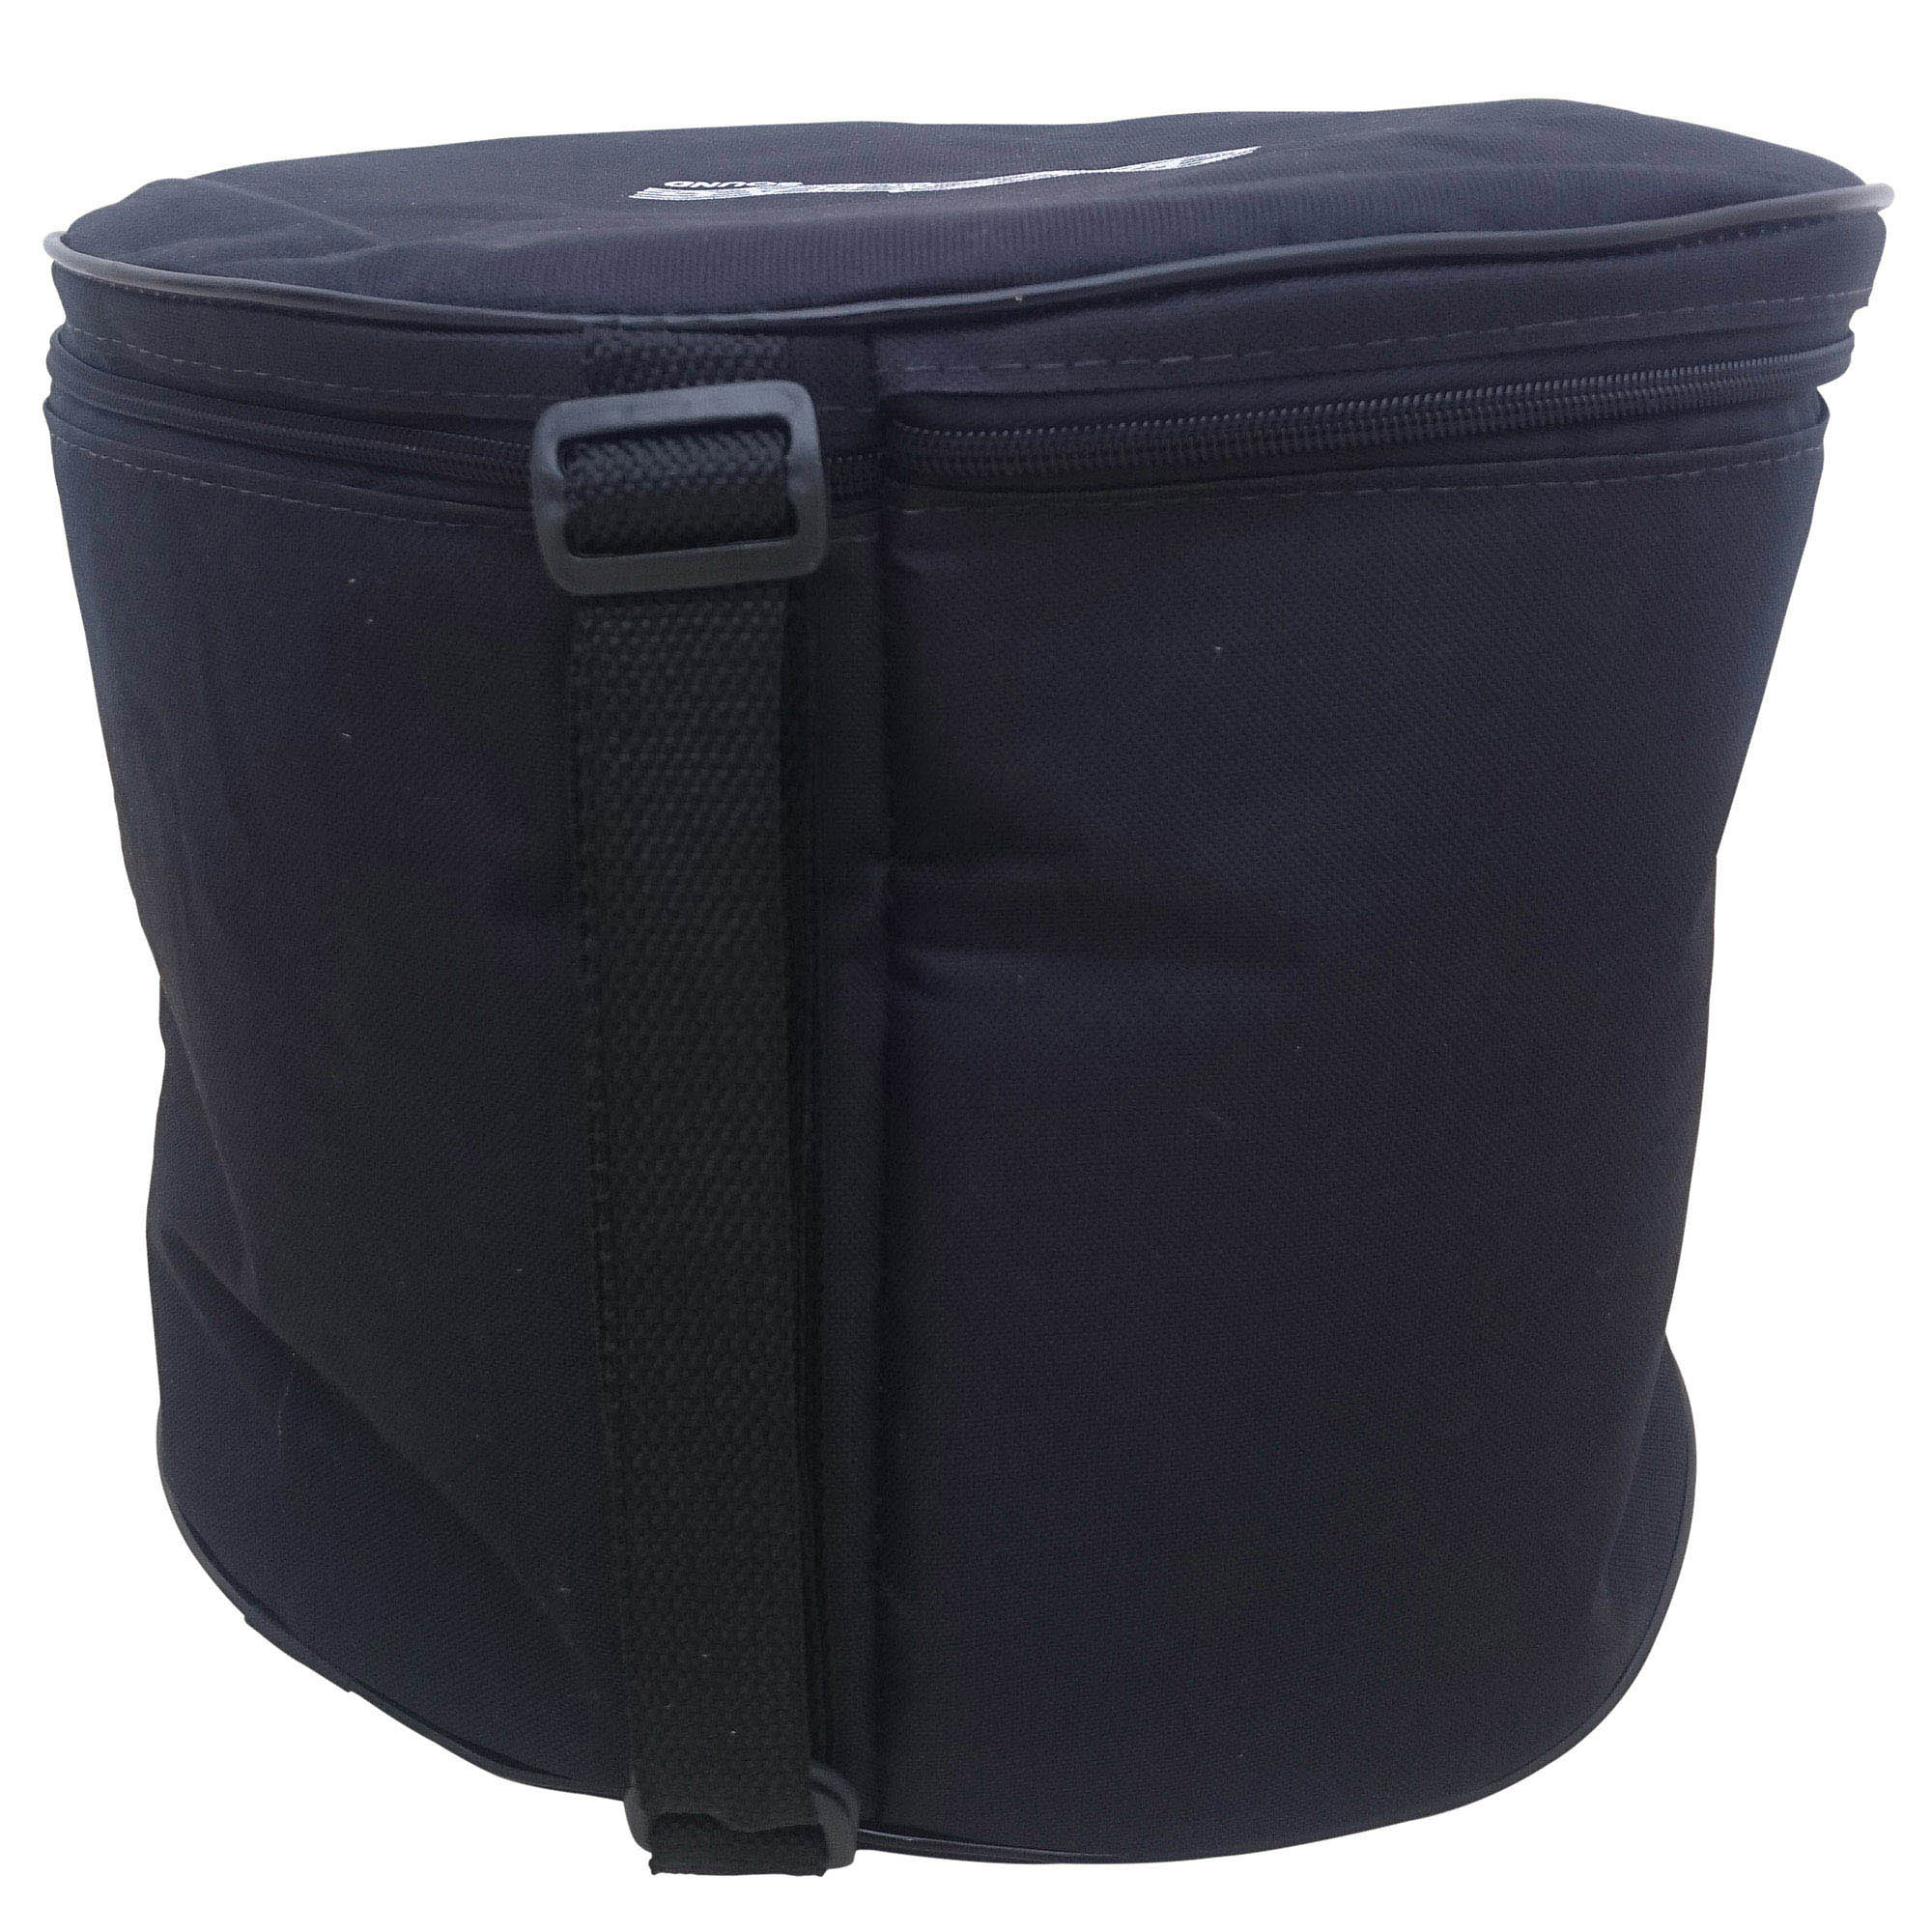 "Capa Bag Extra Luxo para Surdo 16"" para Bateria CLAVE & BAG. Totalmente acolchoado"